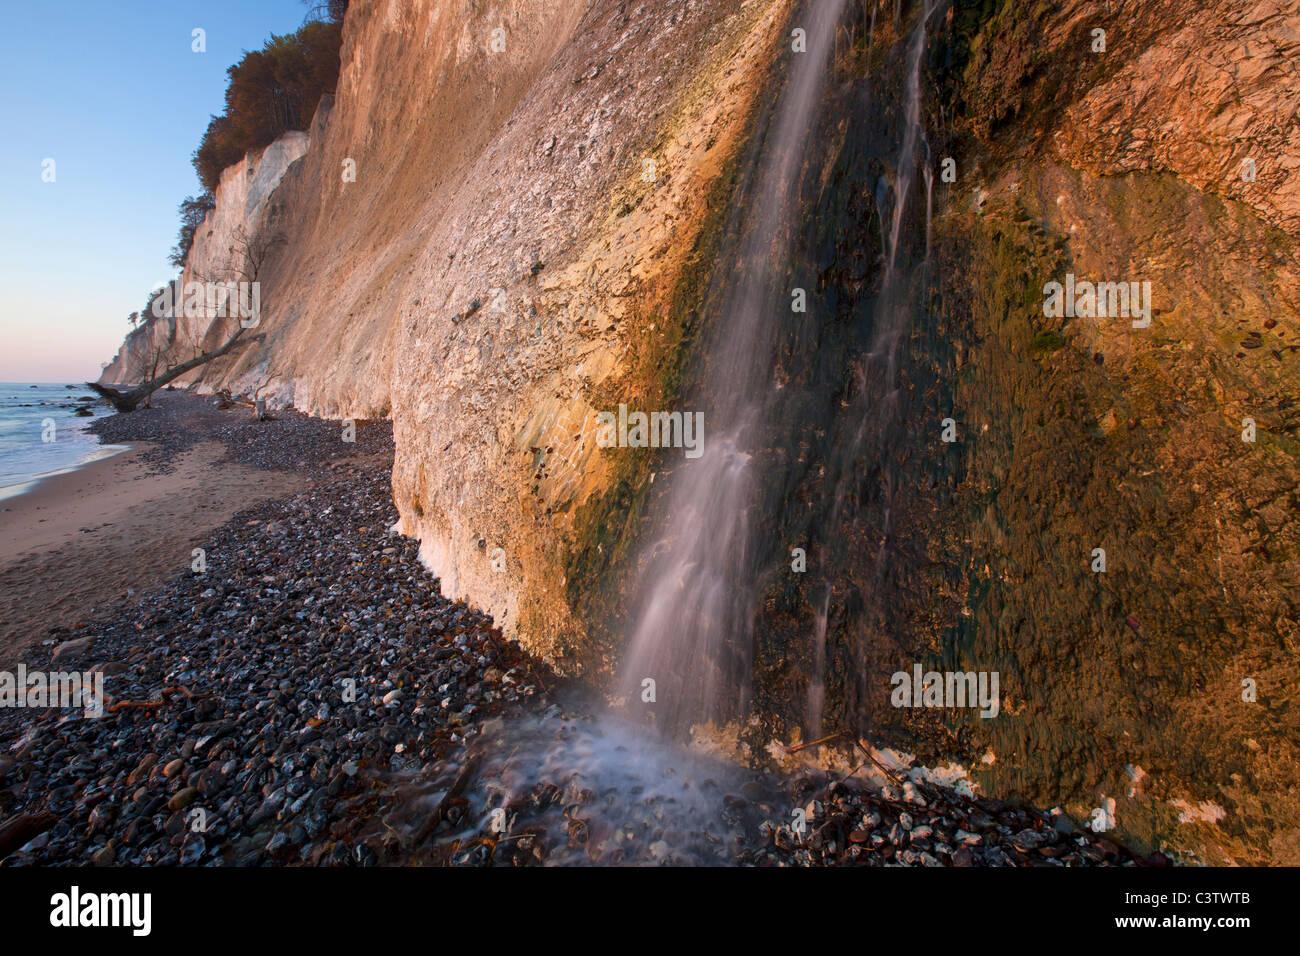 Waterfall at the Kieler Bach, Jasmund National Park, Ruegen island, Mecklenburg-Western Pomerania, Germany - Stock Image